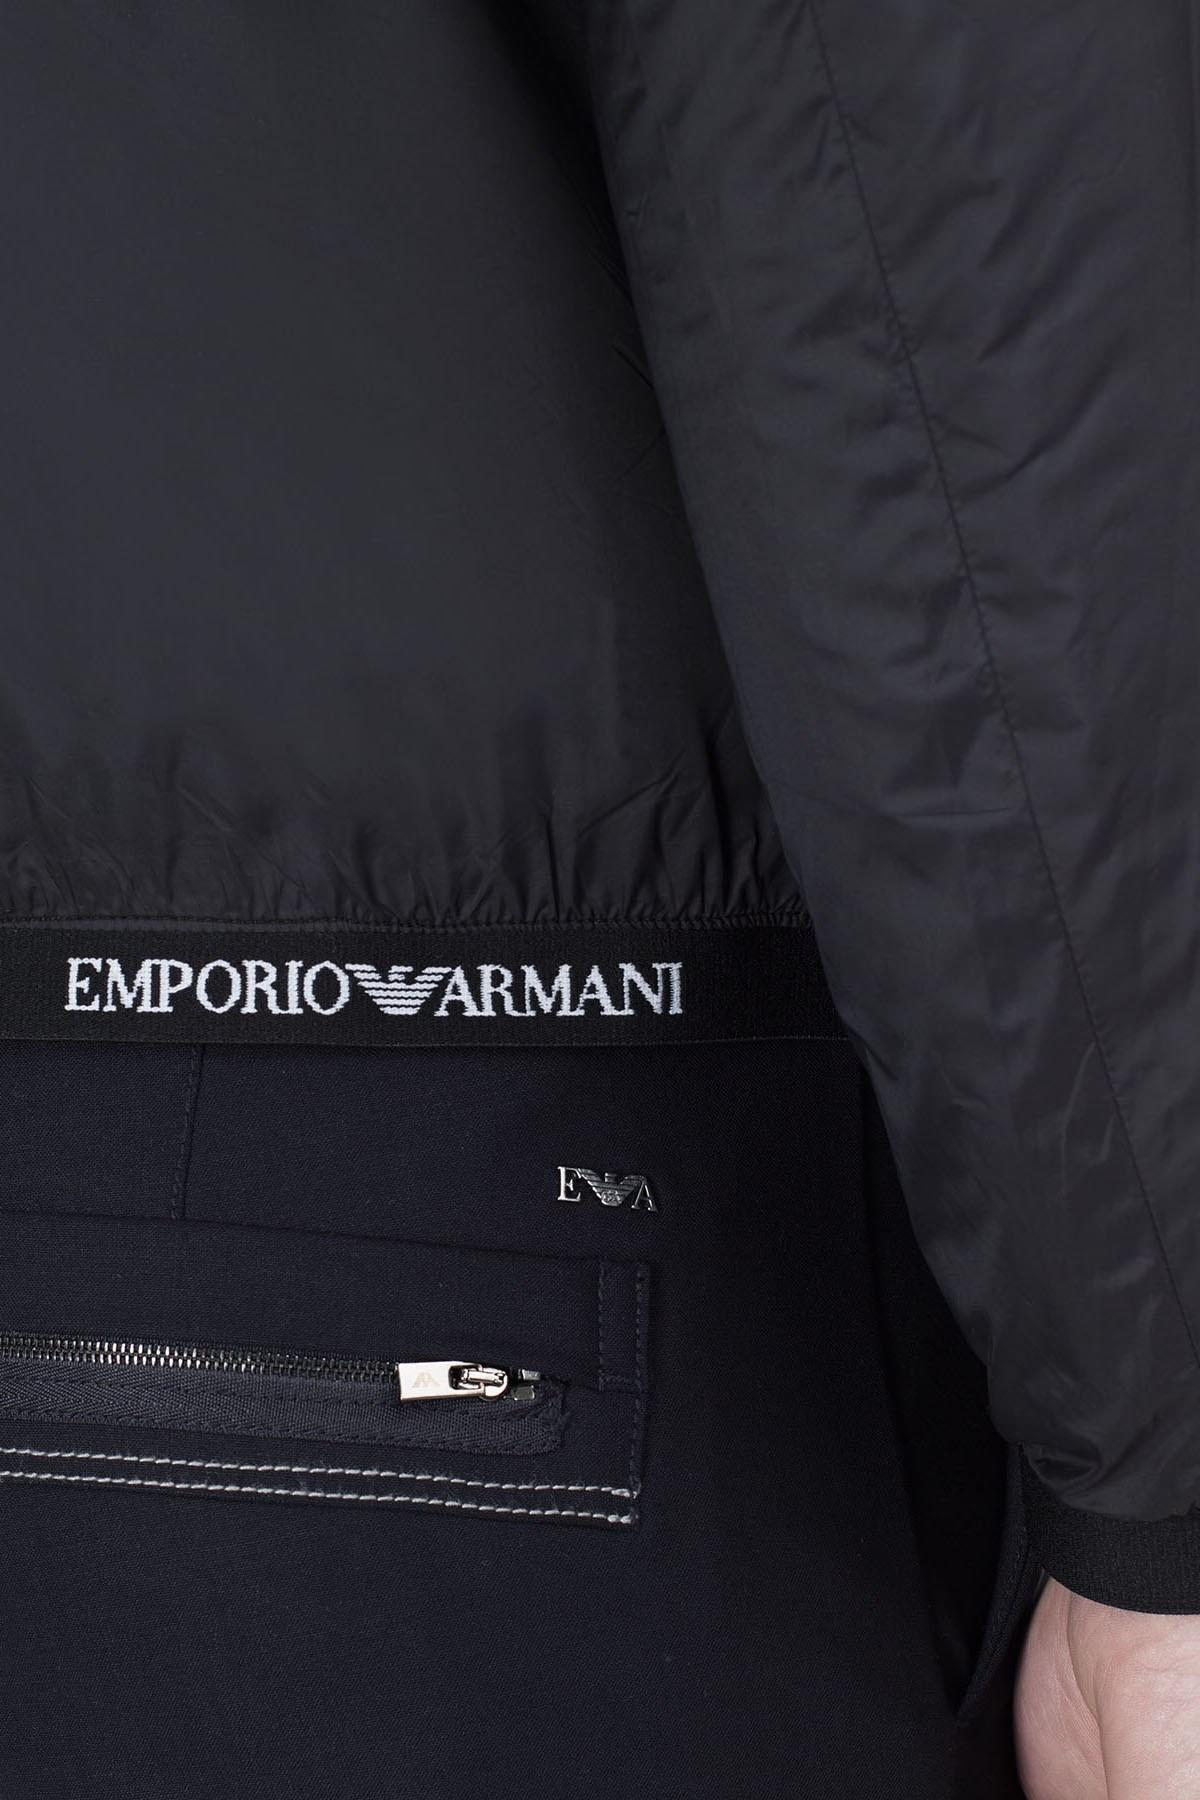 Emporio Armani Çift Taraflı Erkek Mont S 6G1B97 1NUNZ F545 HAKİ